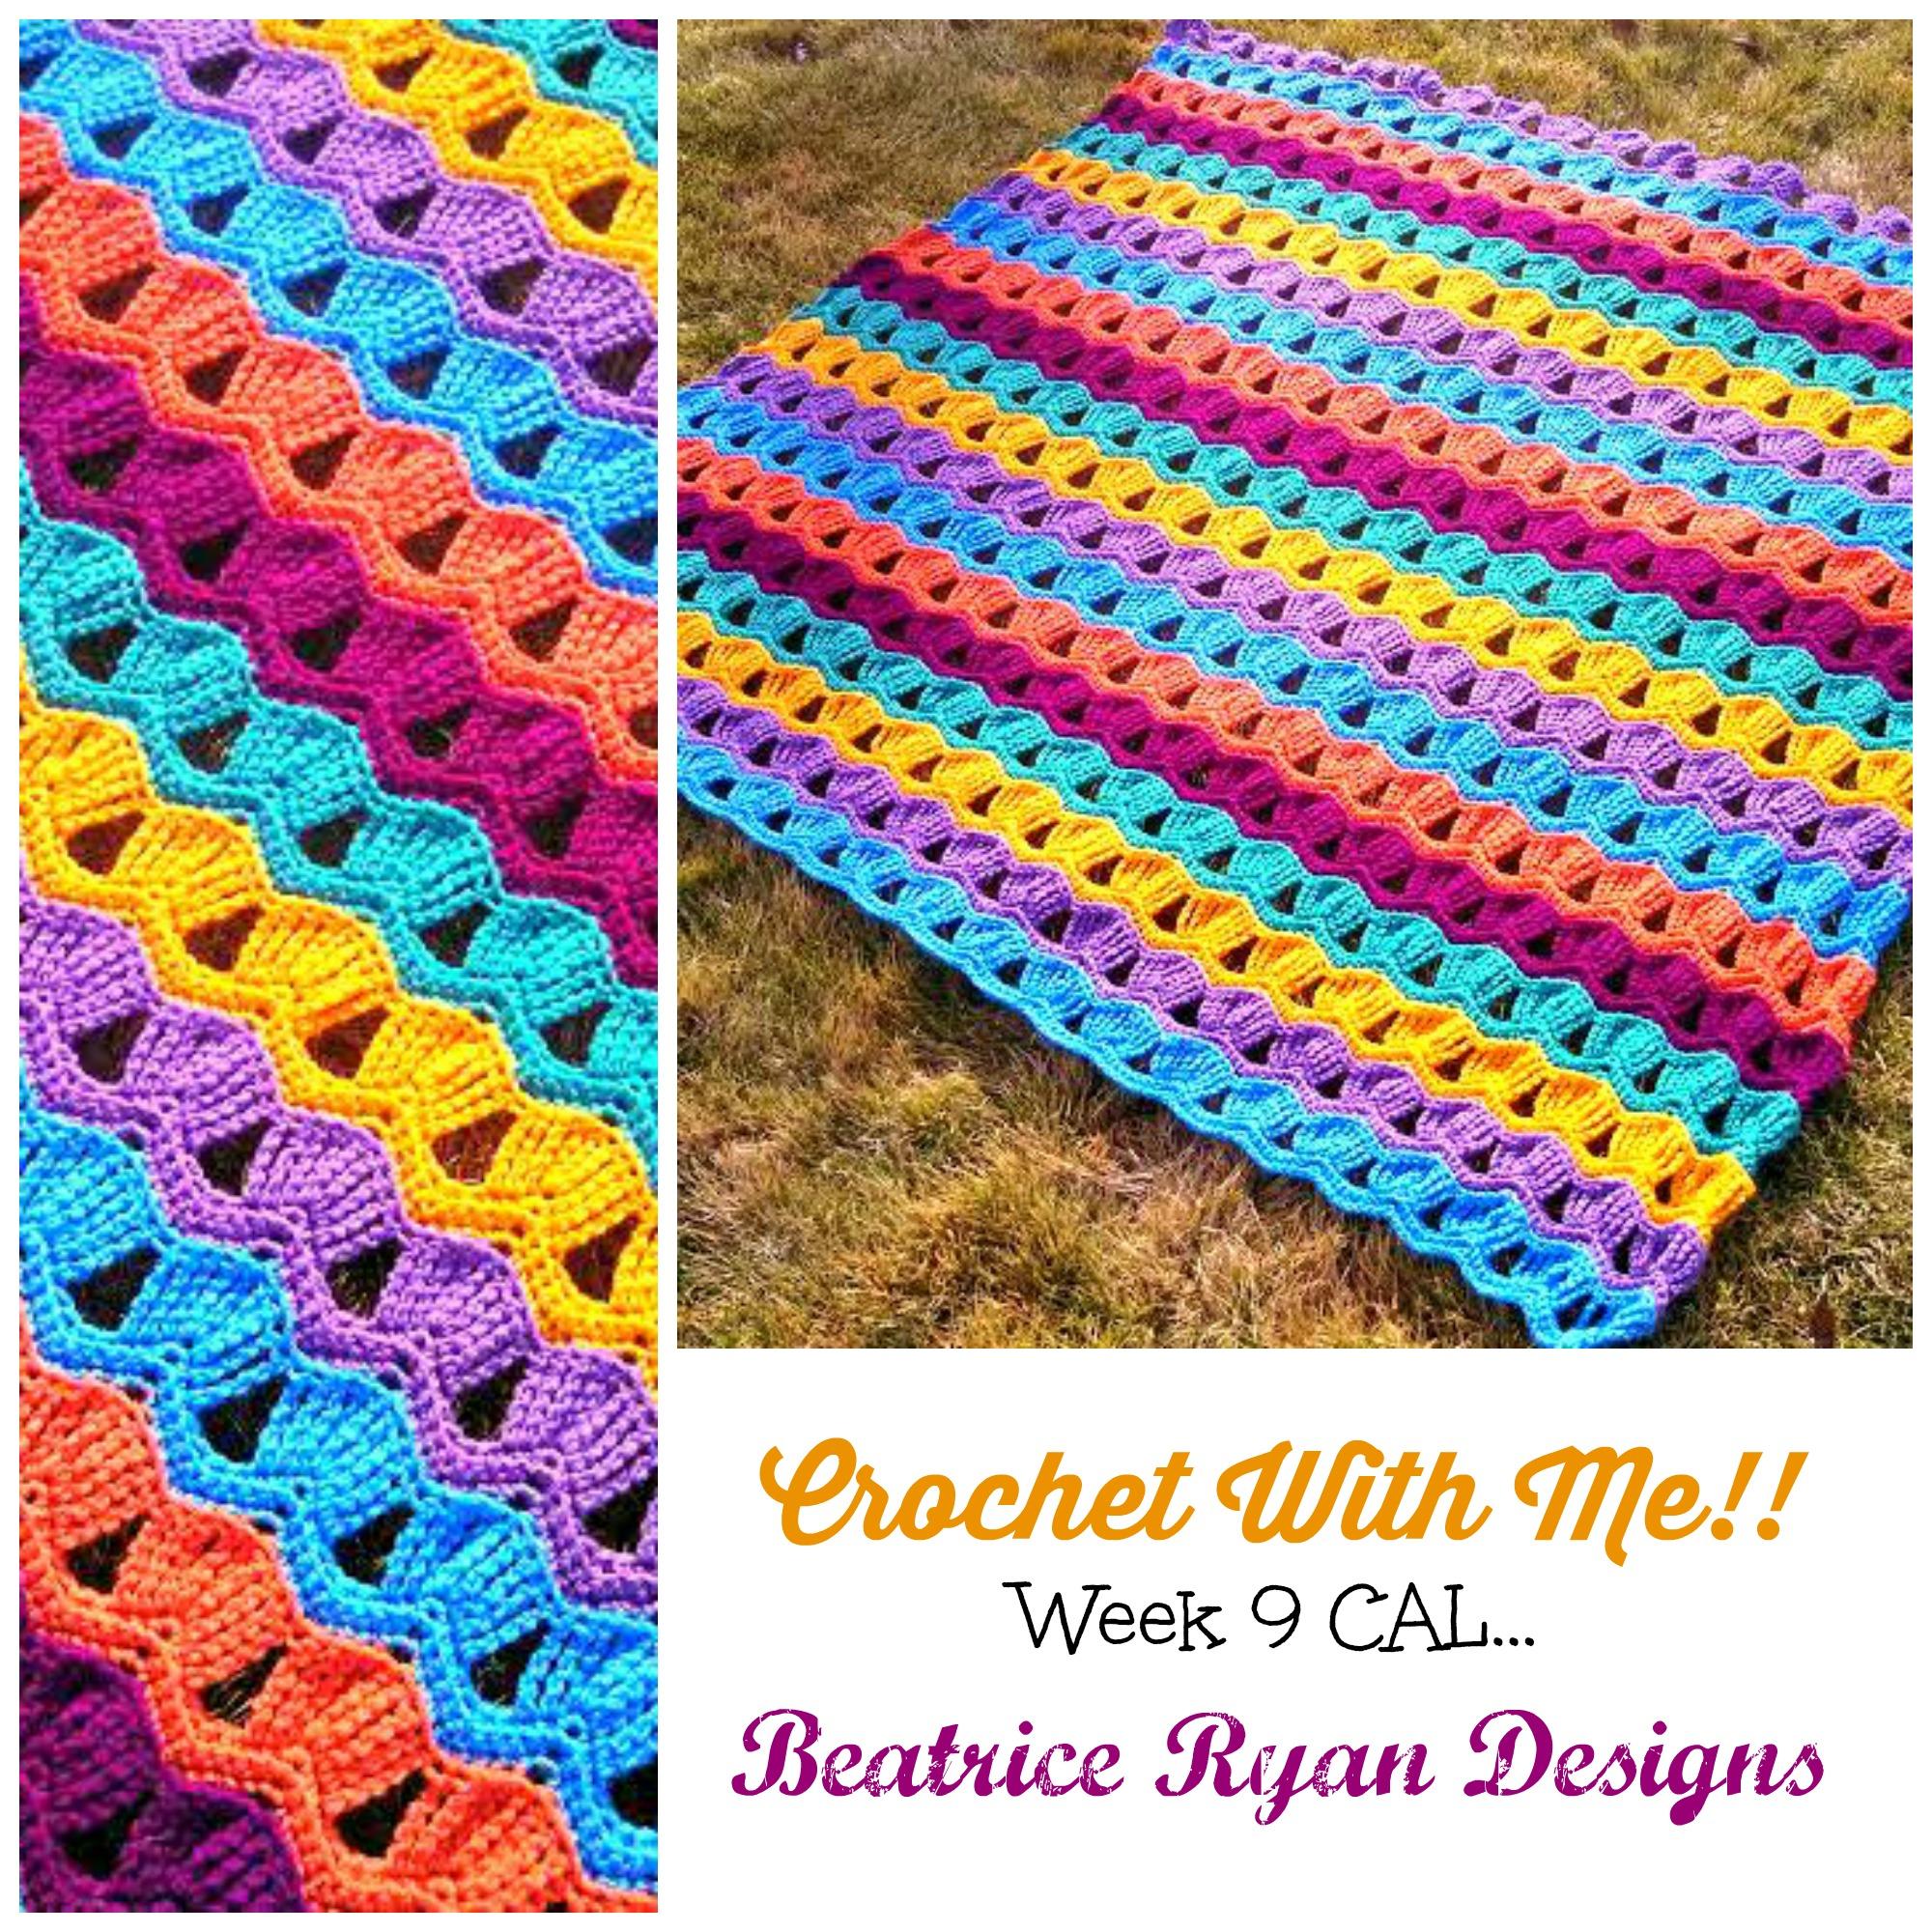 Crochet With Me… Week 9 CAL!!!